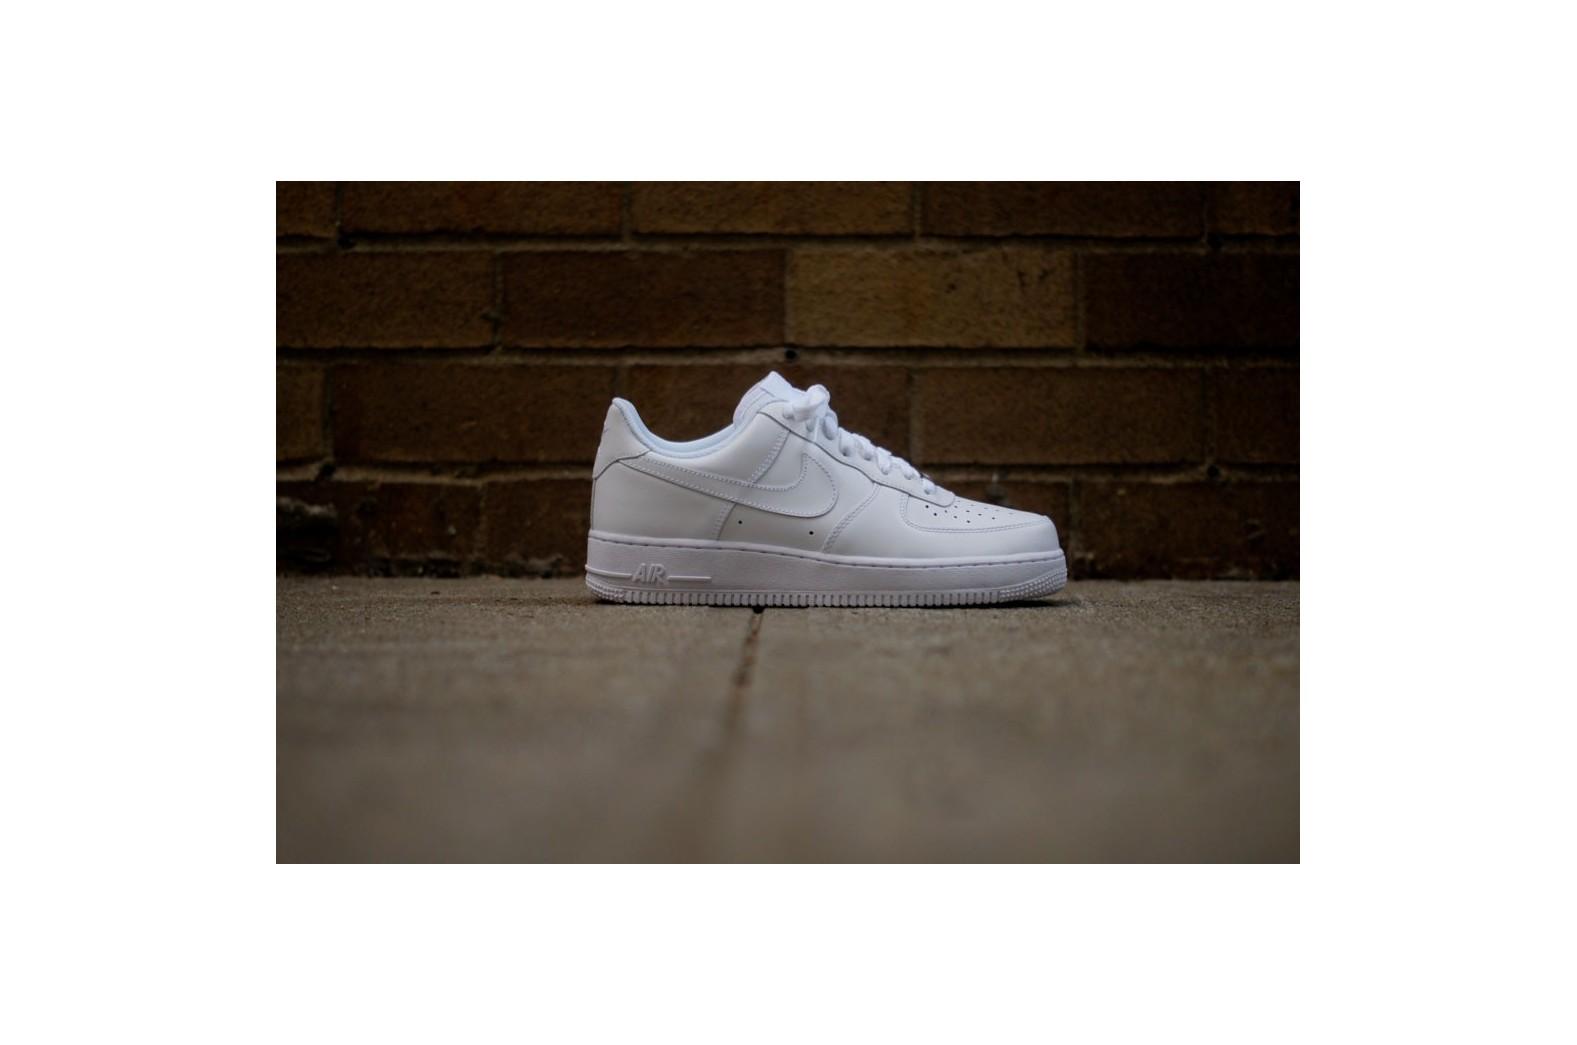 d207d48e5bd3 Мужские кроссовки Nike Air Force 1 Low - White   White   Интернет-магазин  Sole